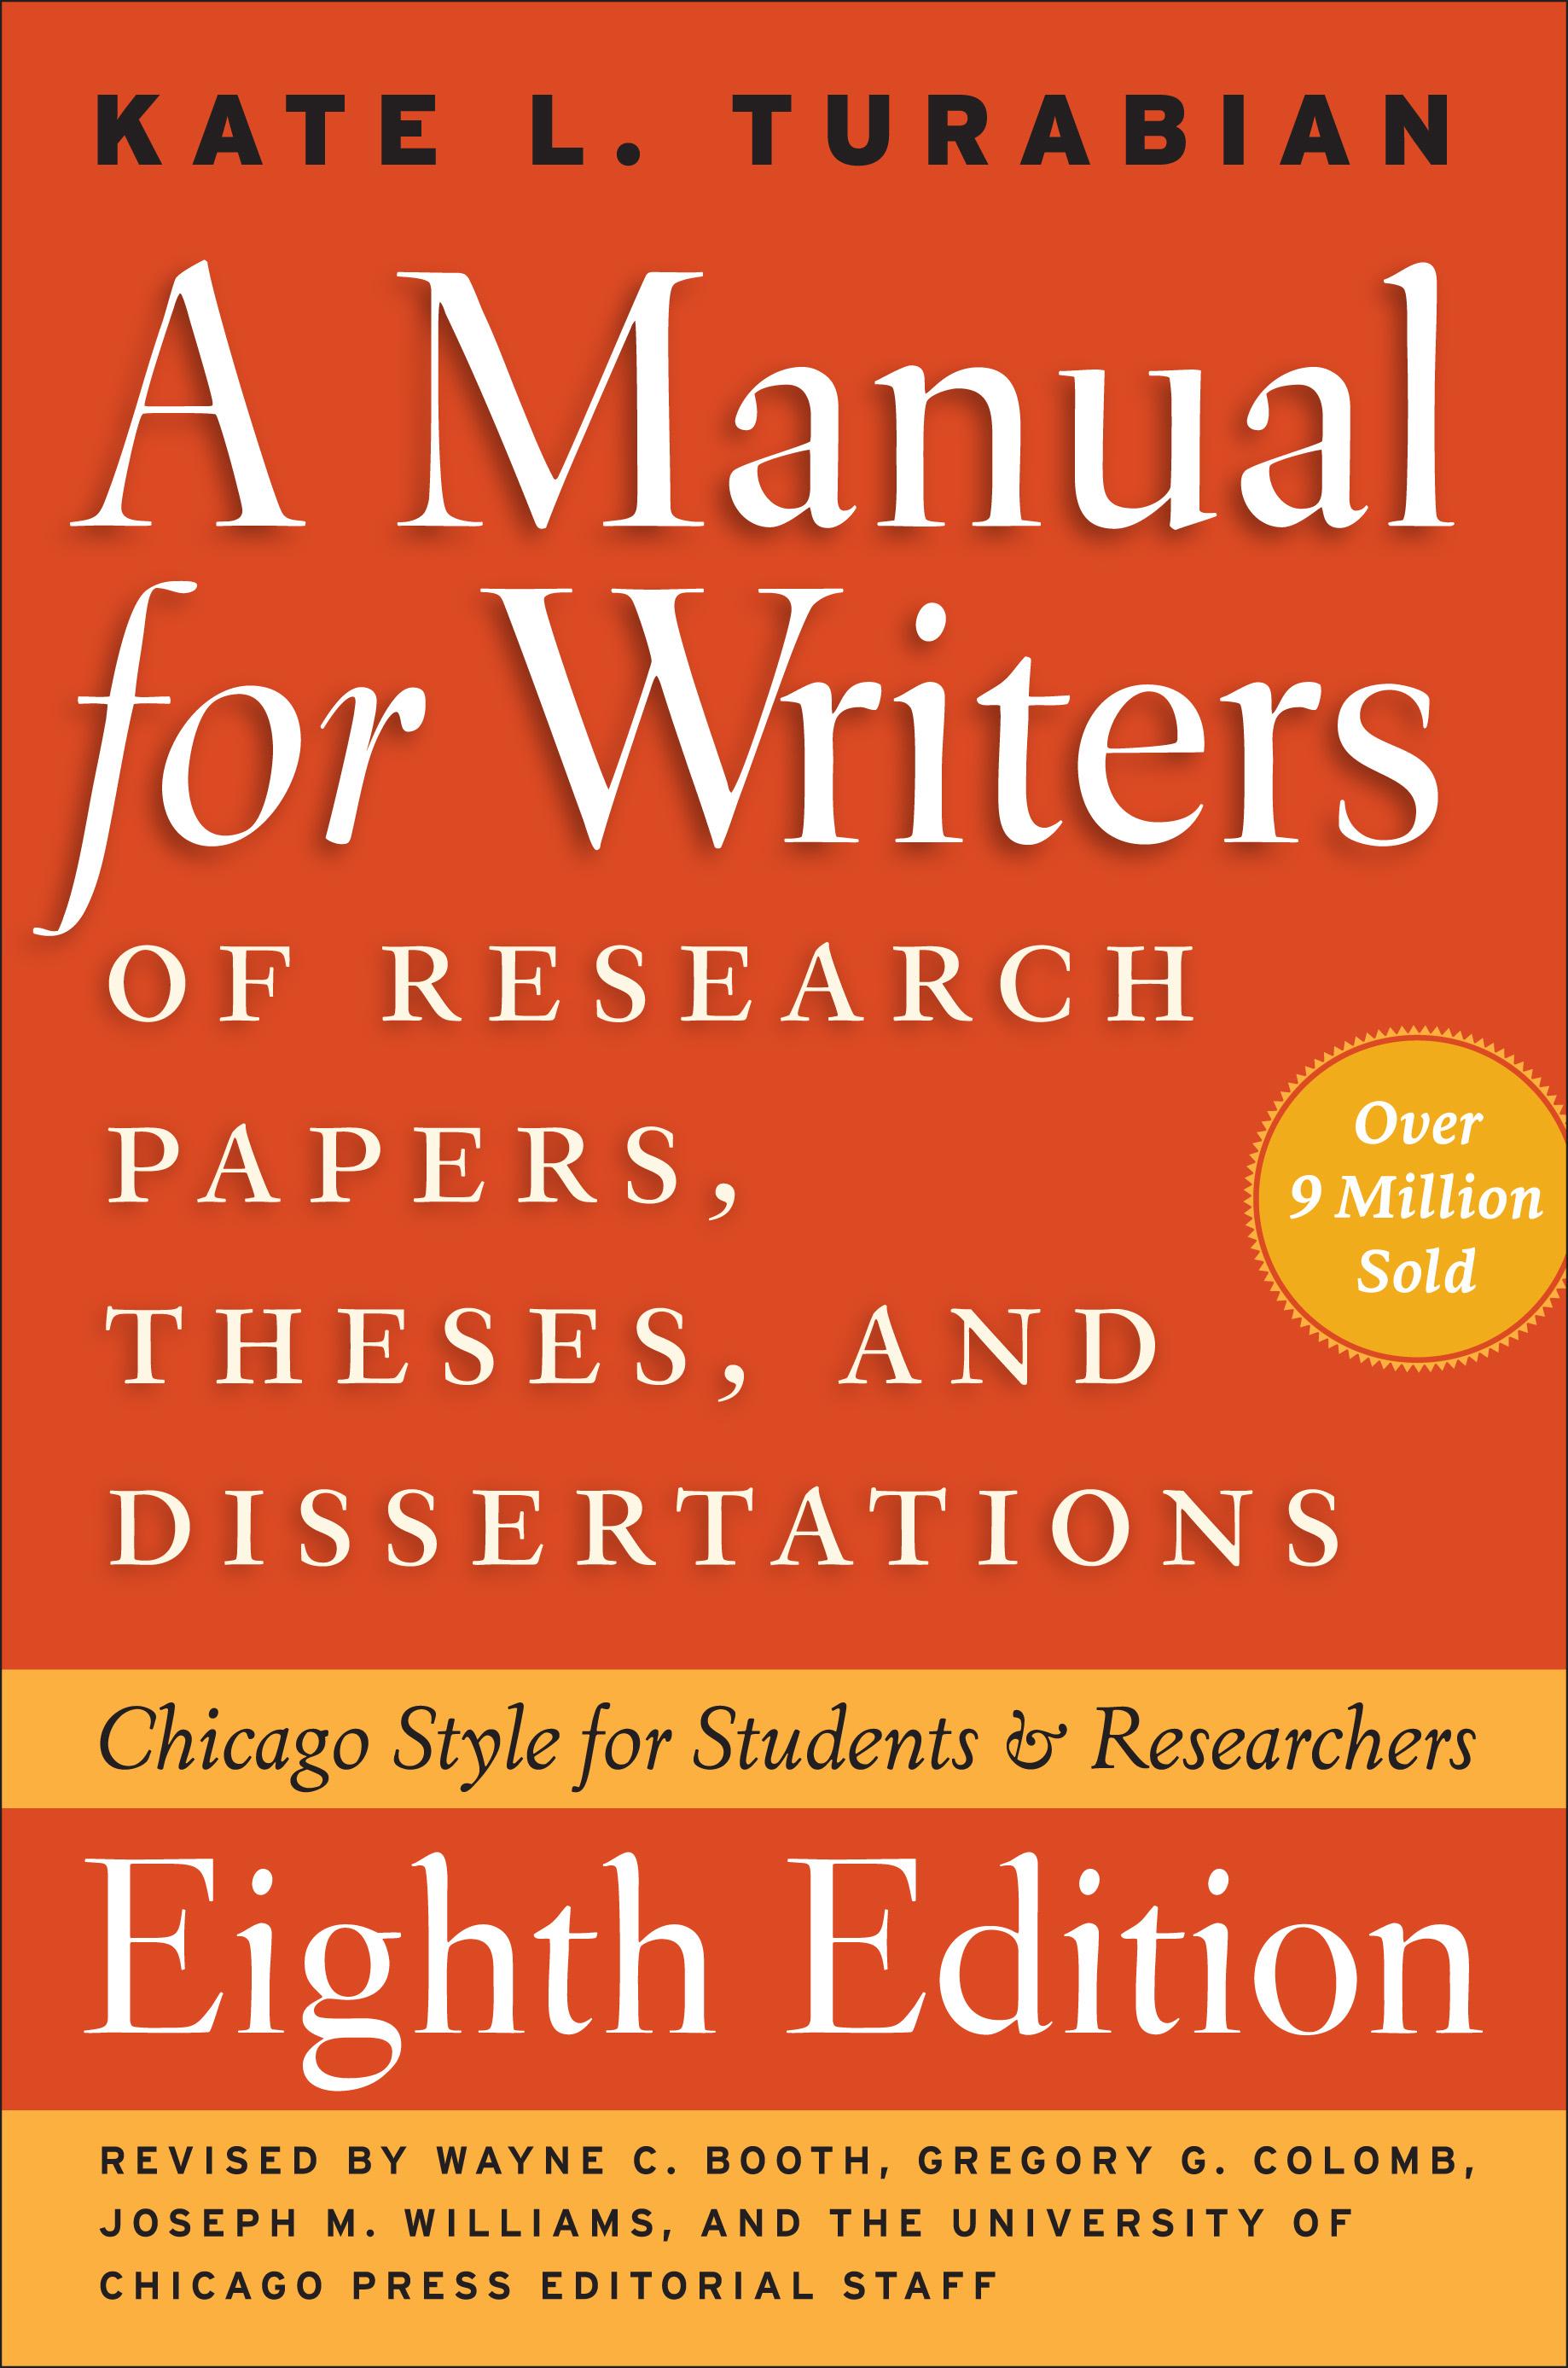 Manual for Writers.jpg